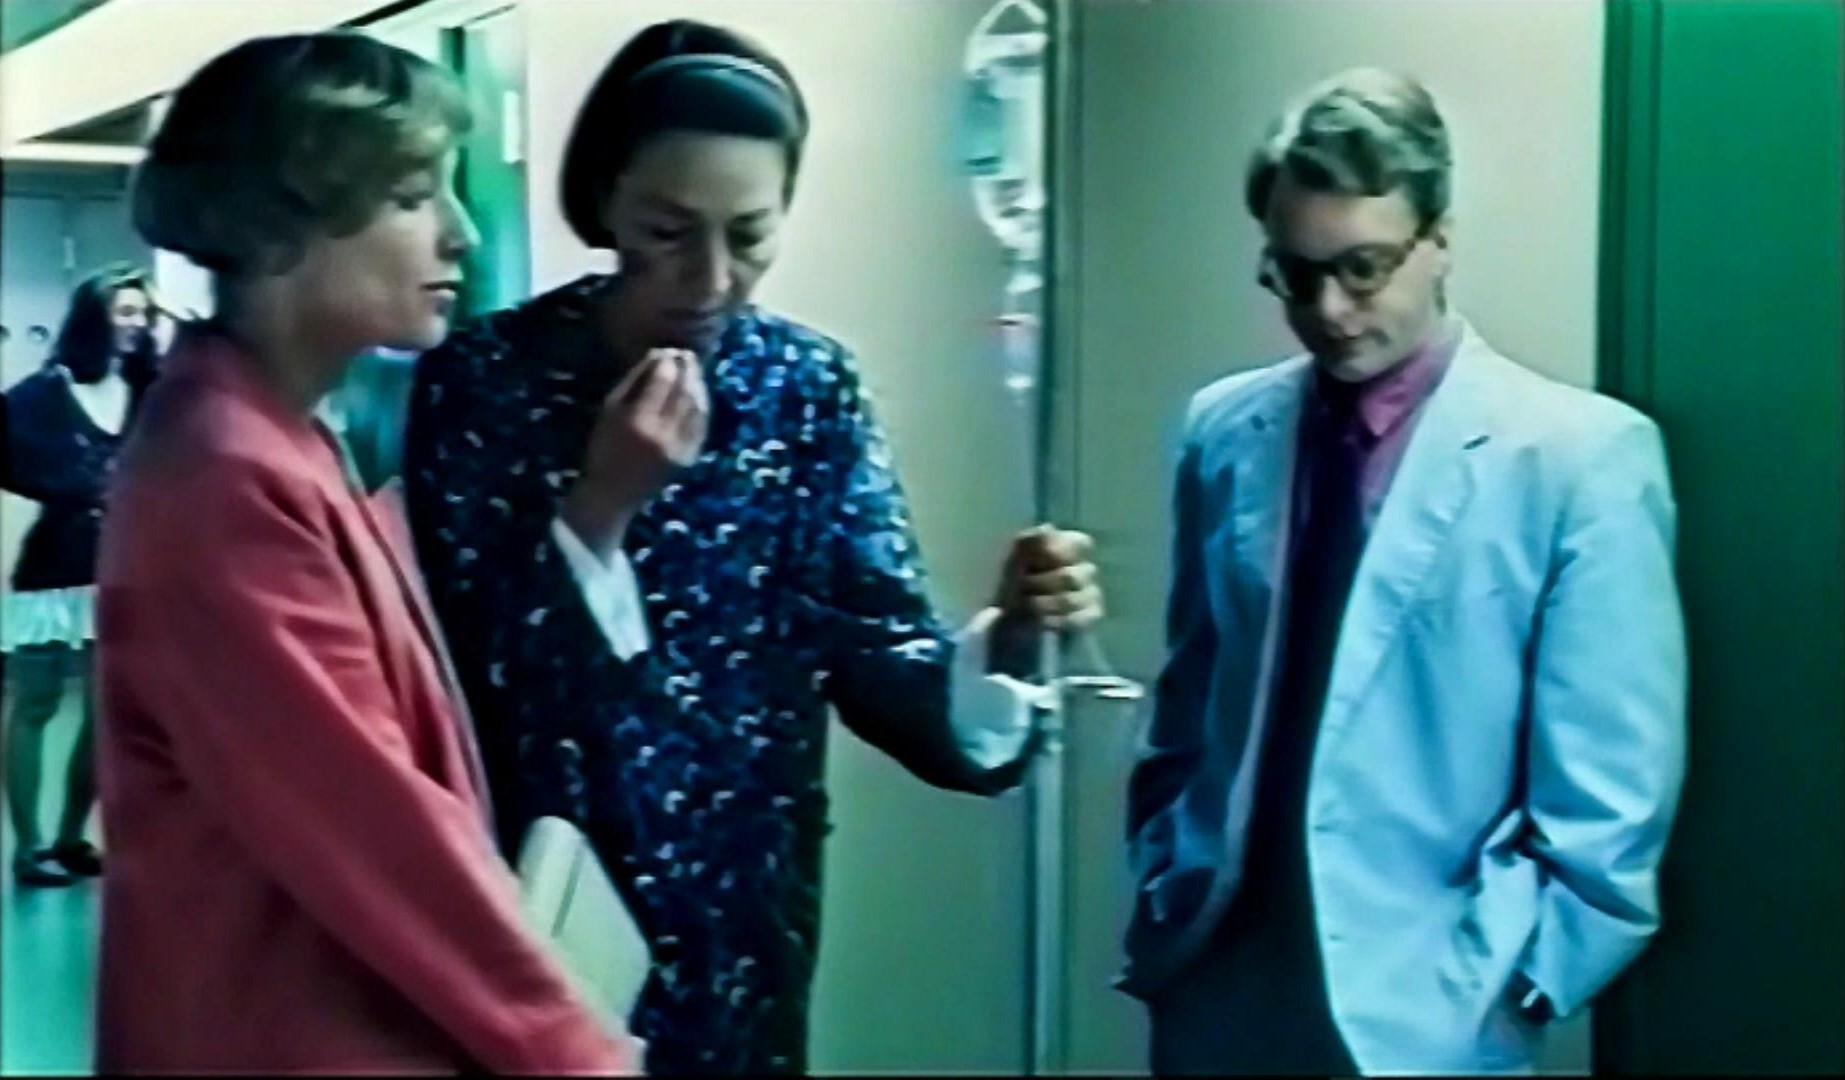 Marta Klubowicz, Reinhard Nowak, and Marianne Pardeller in Morula (1994)